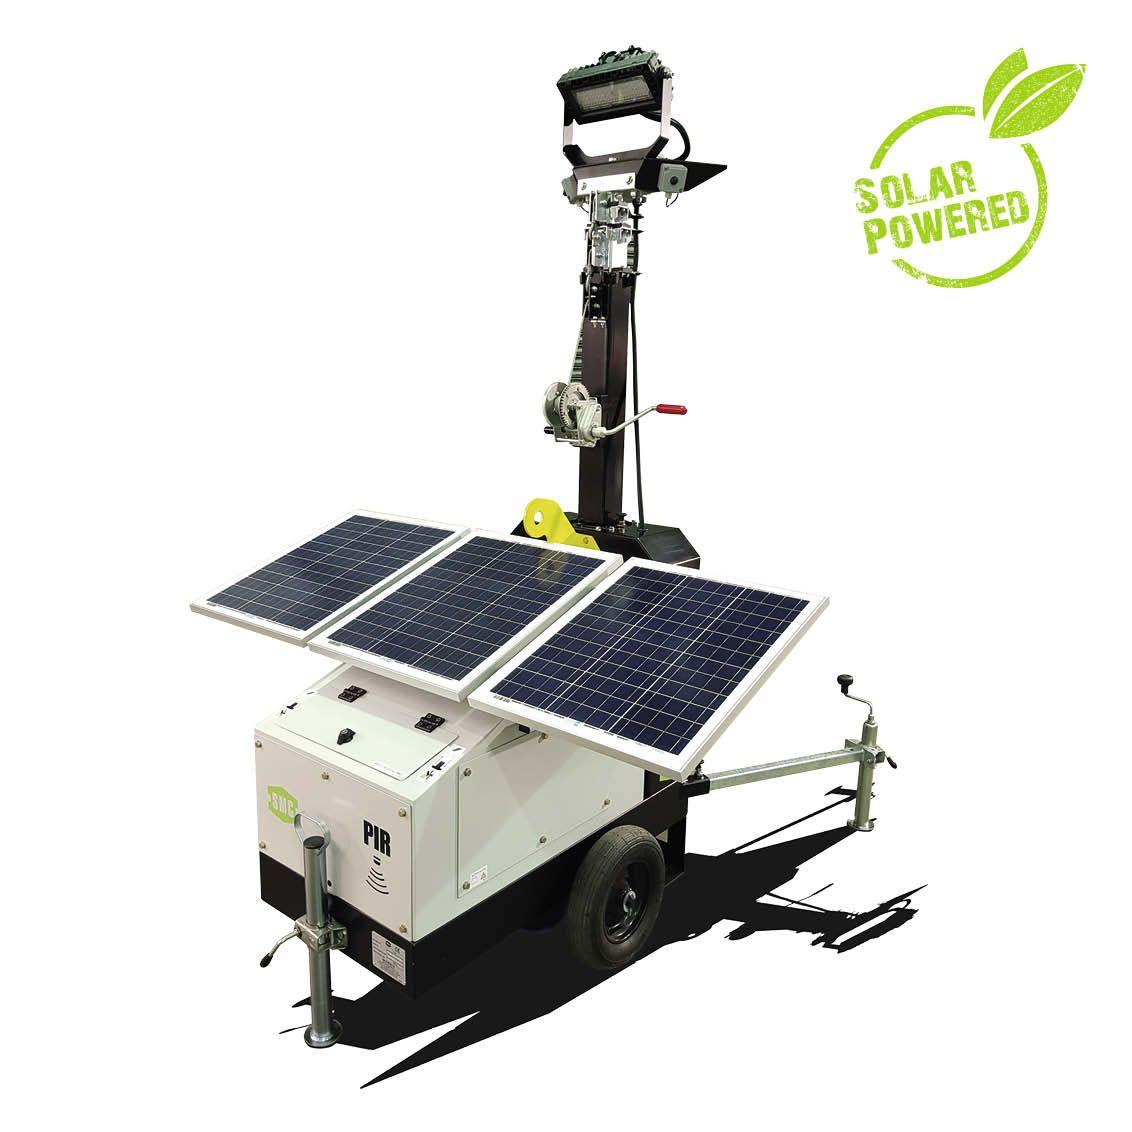 SMC TL60 Solar